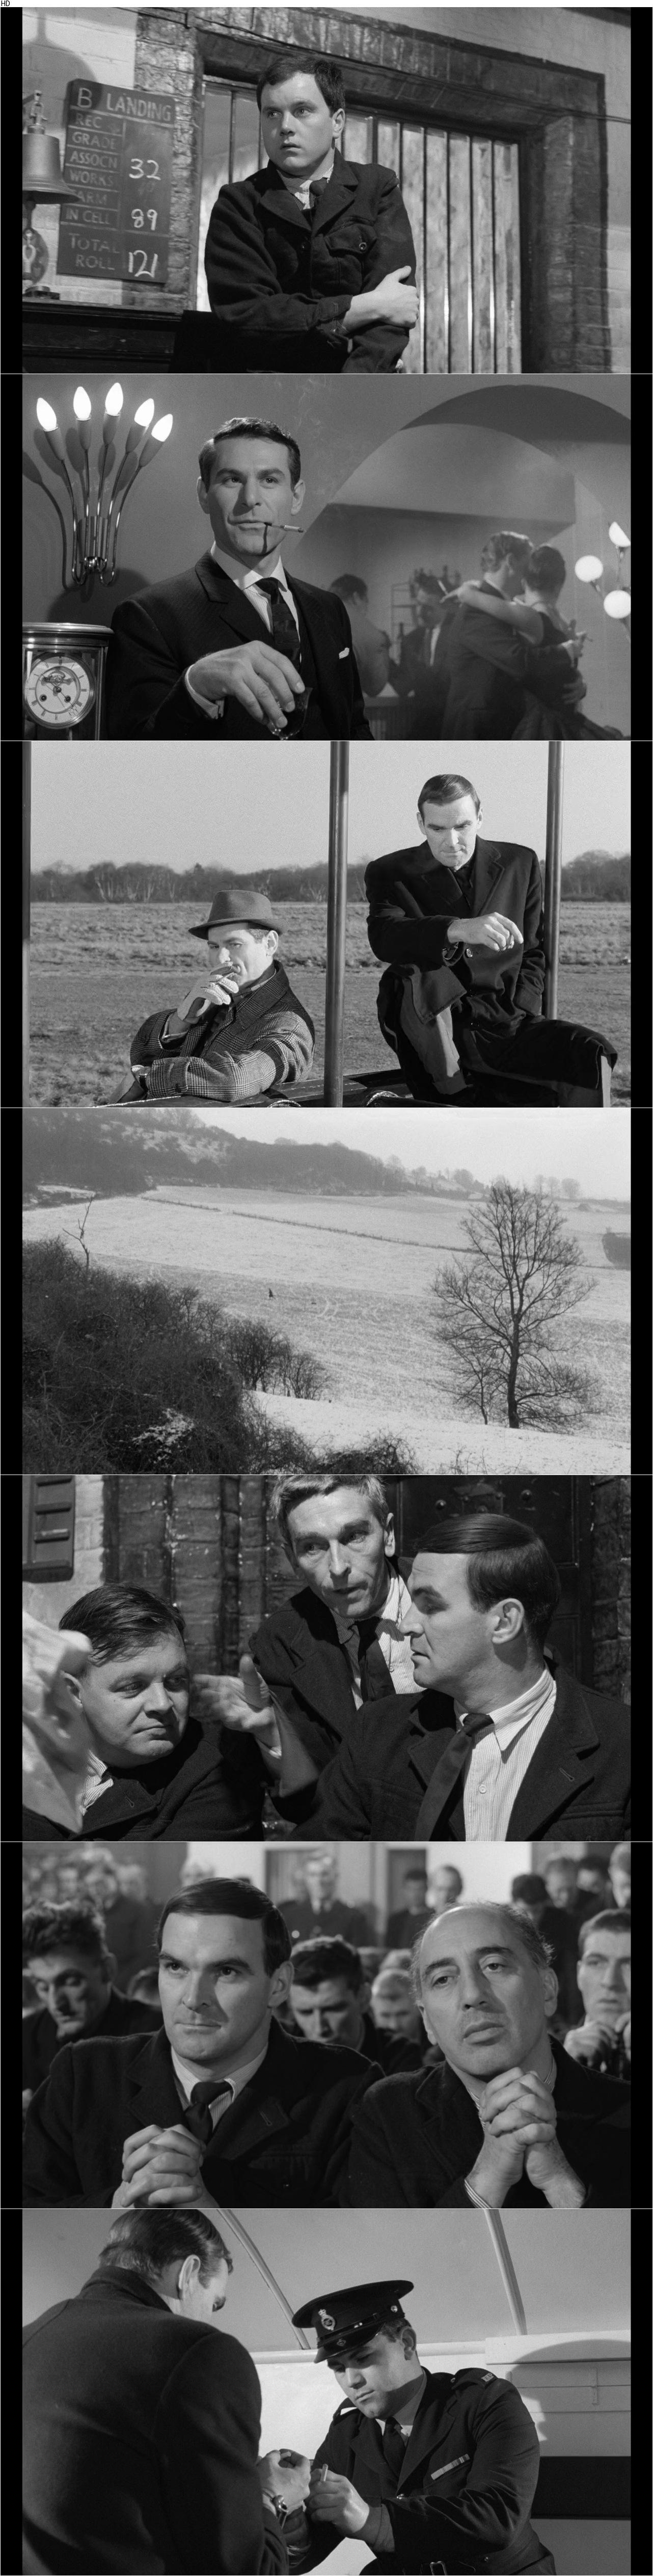 The Criminal (1960)